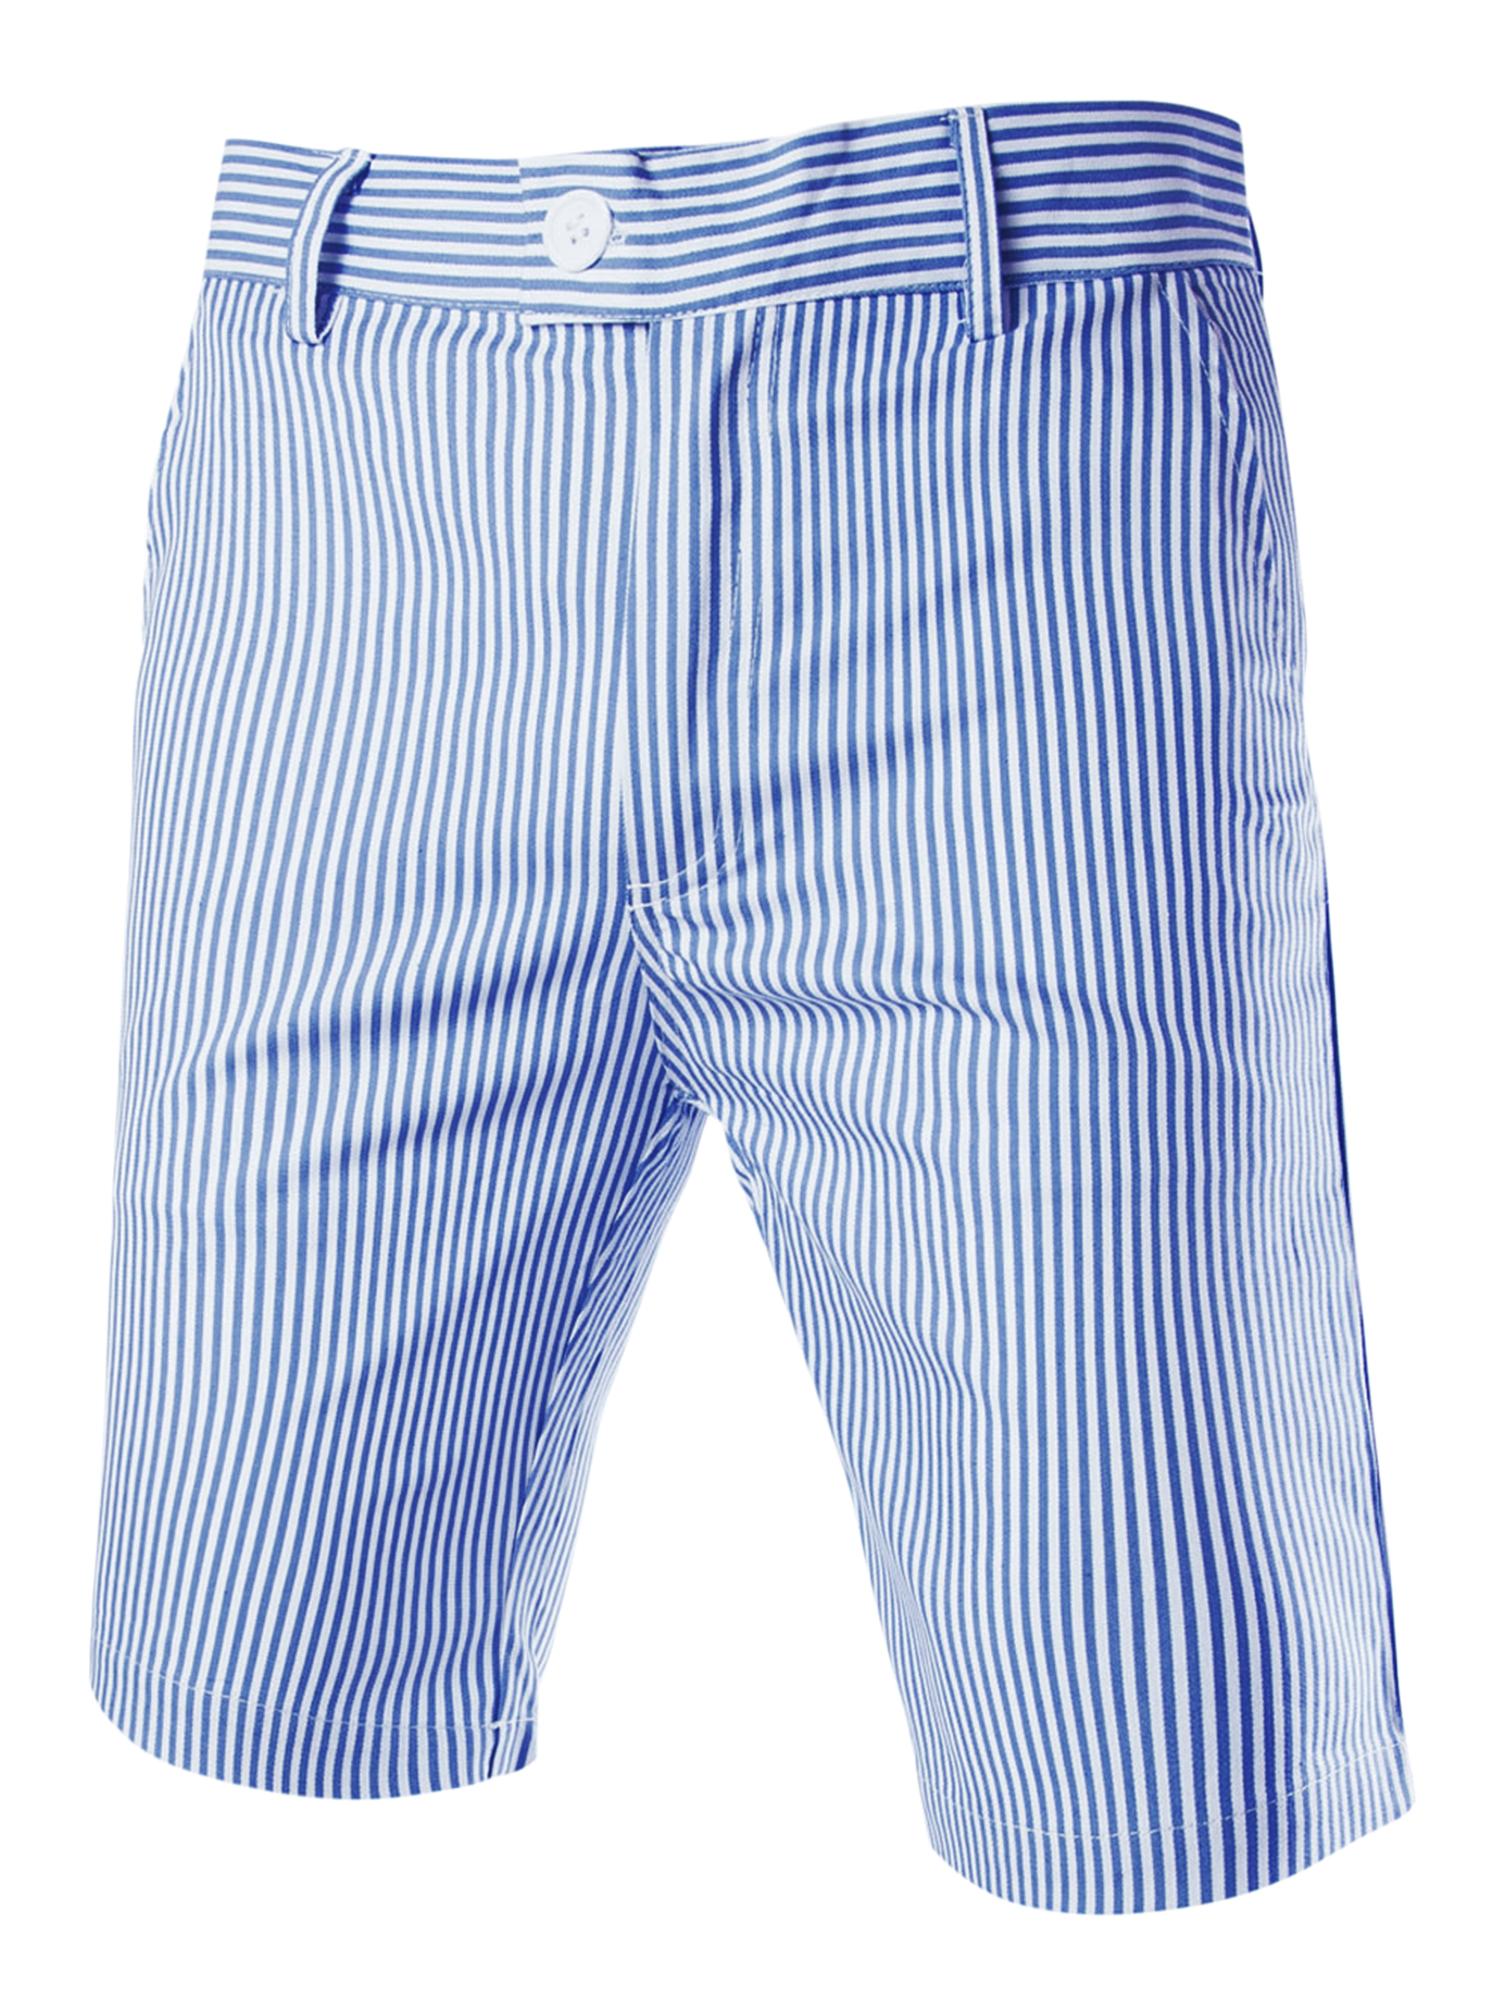 Men Vertical Stripes Slant Pockets Front Chino Shorts Blue White W32